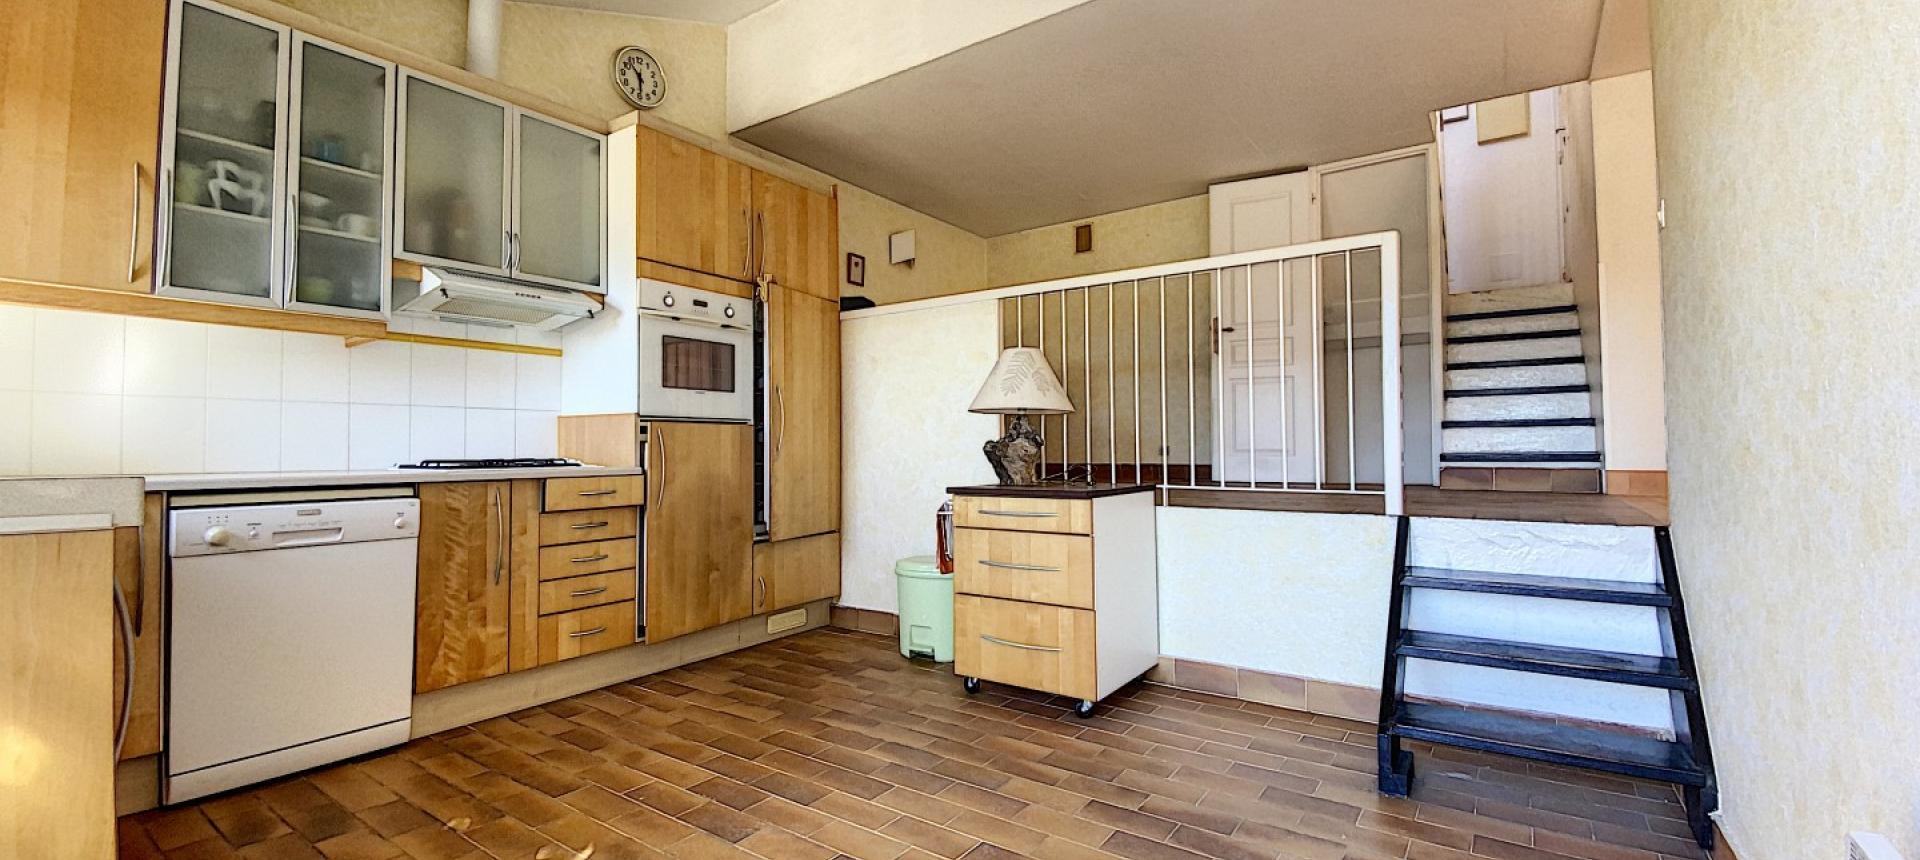 Maison à vendre à Porticcio - Rive sud Ajaccio - Cuisine